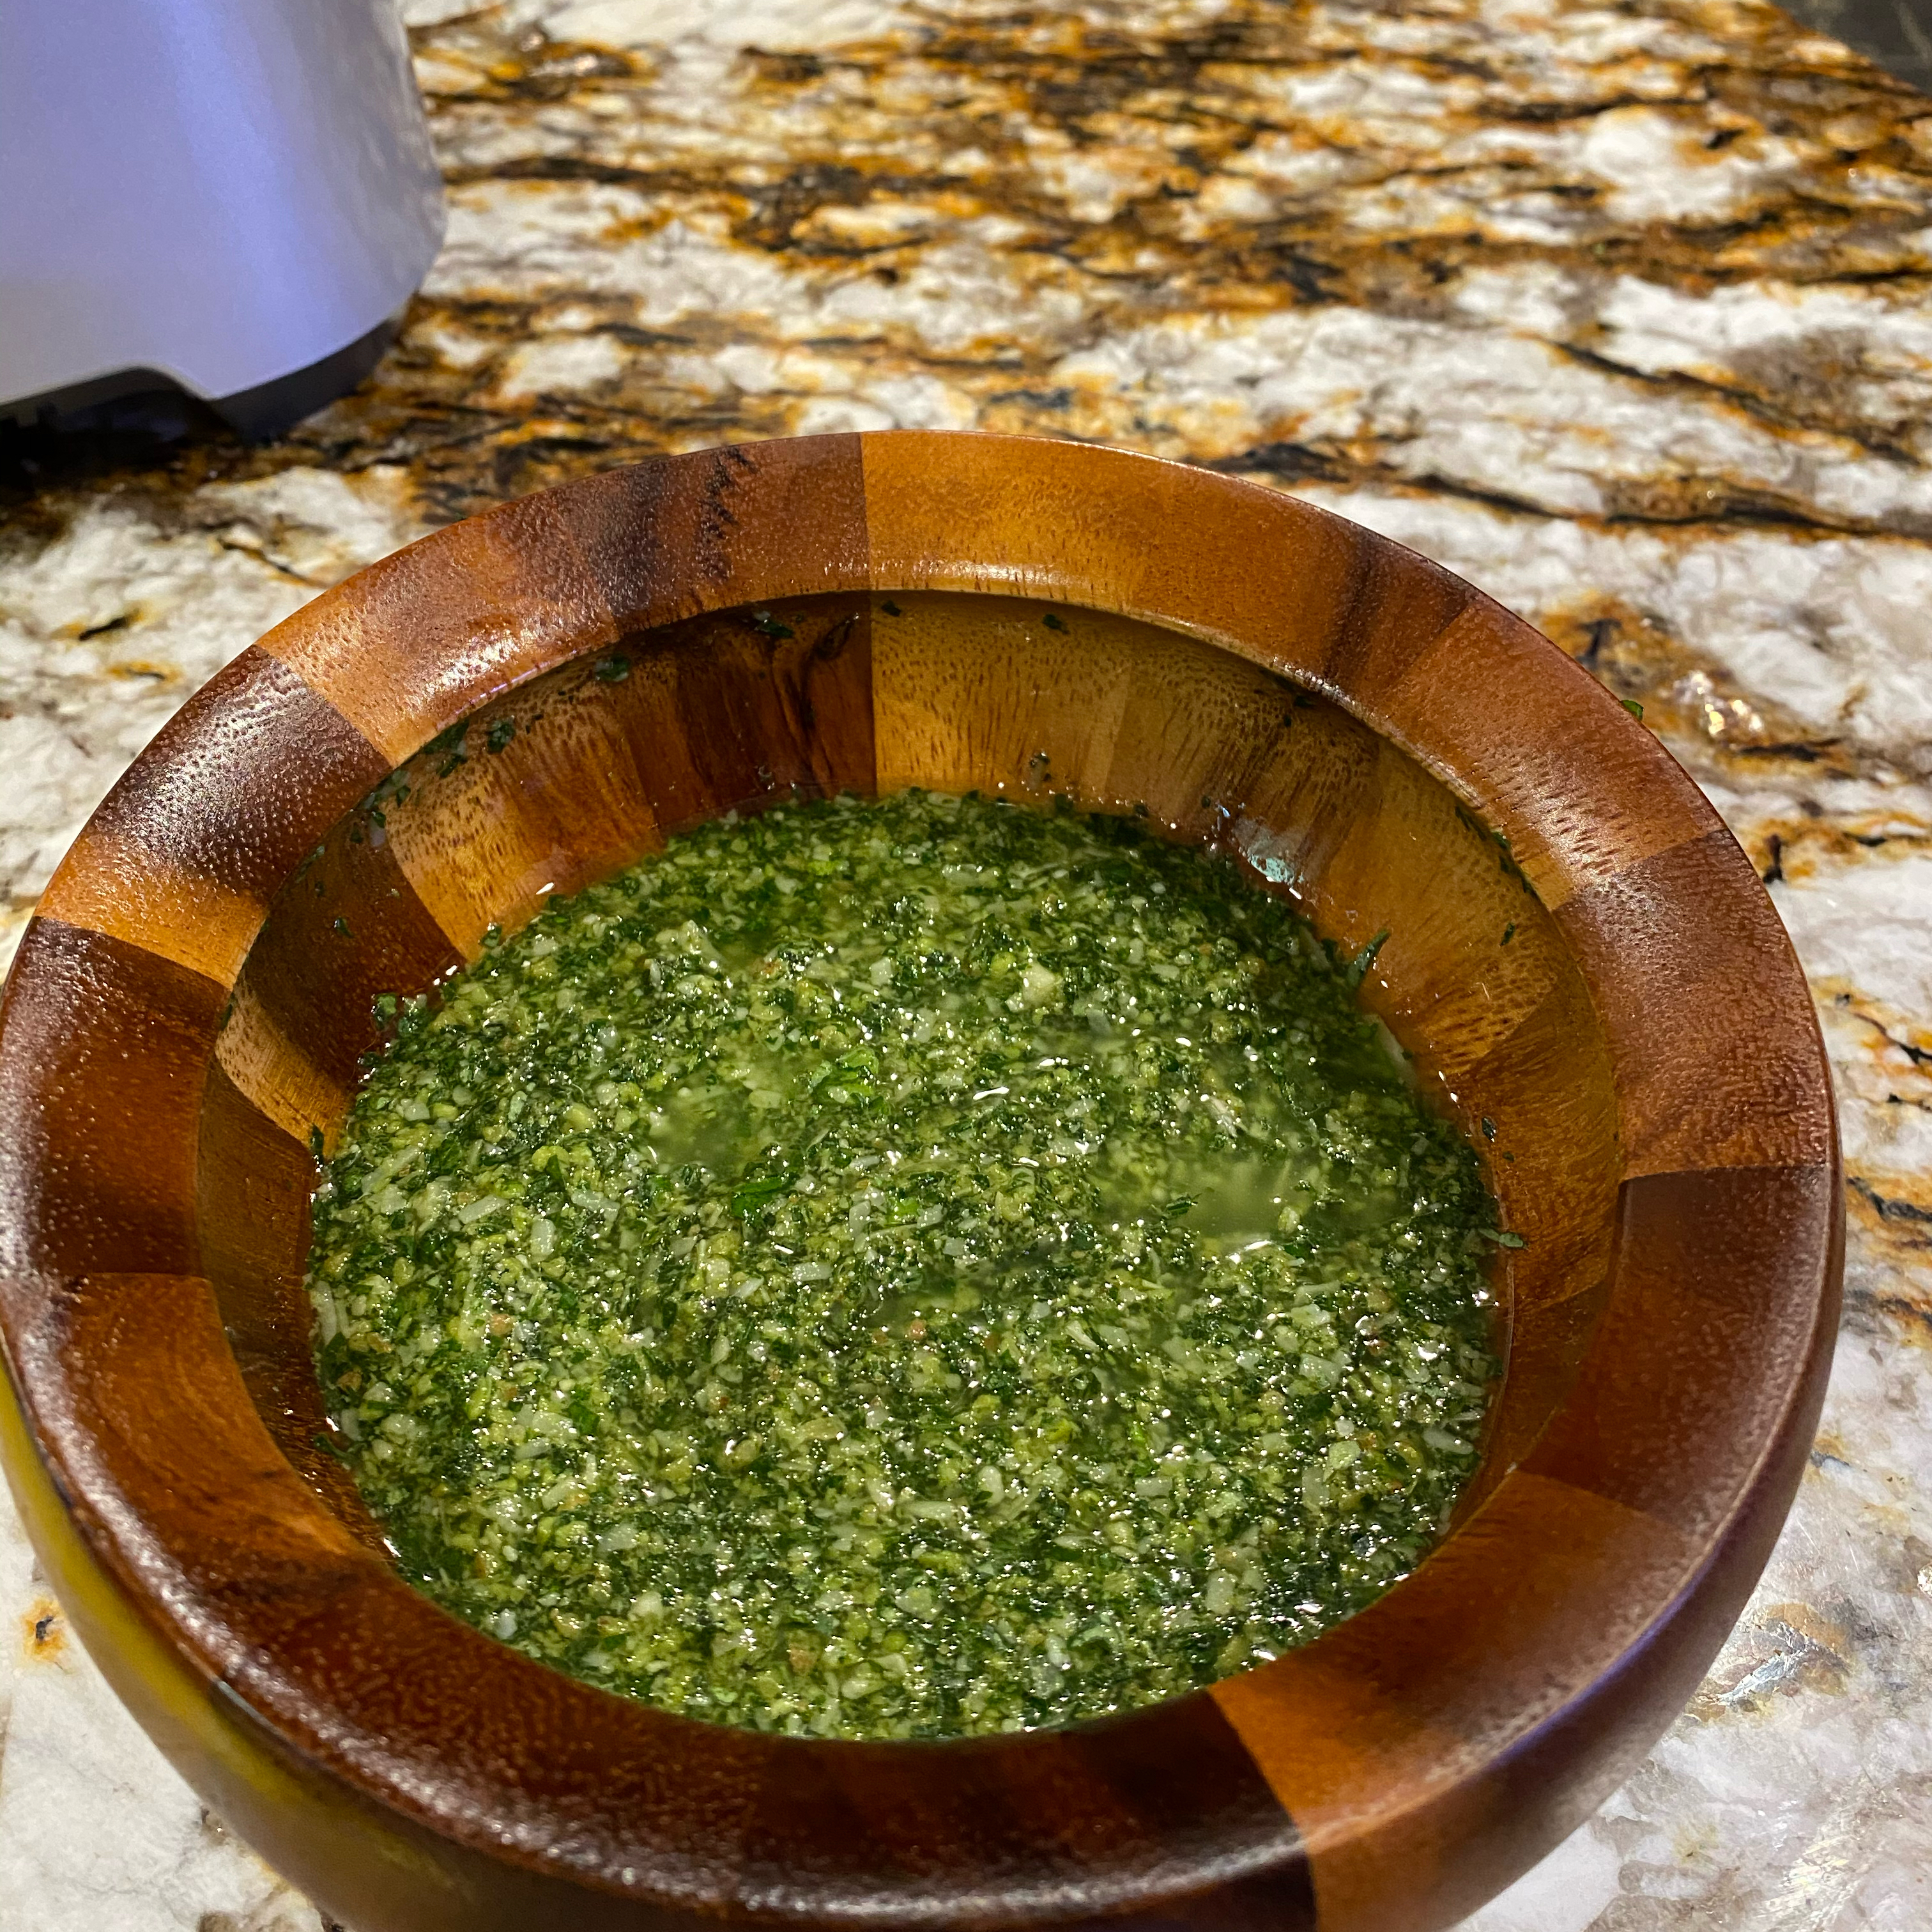 Pesto Genovese (Authentic Italian Basil Pesto) Amy Jane